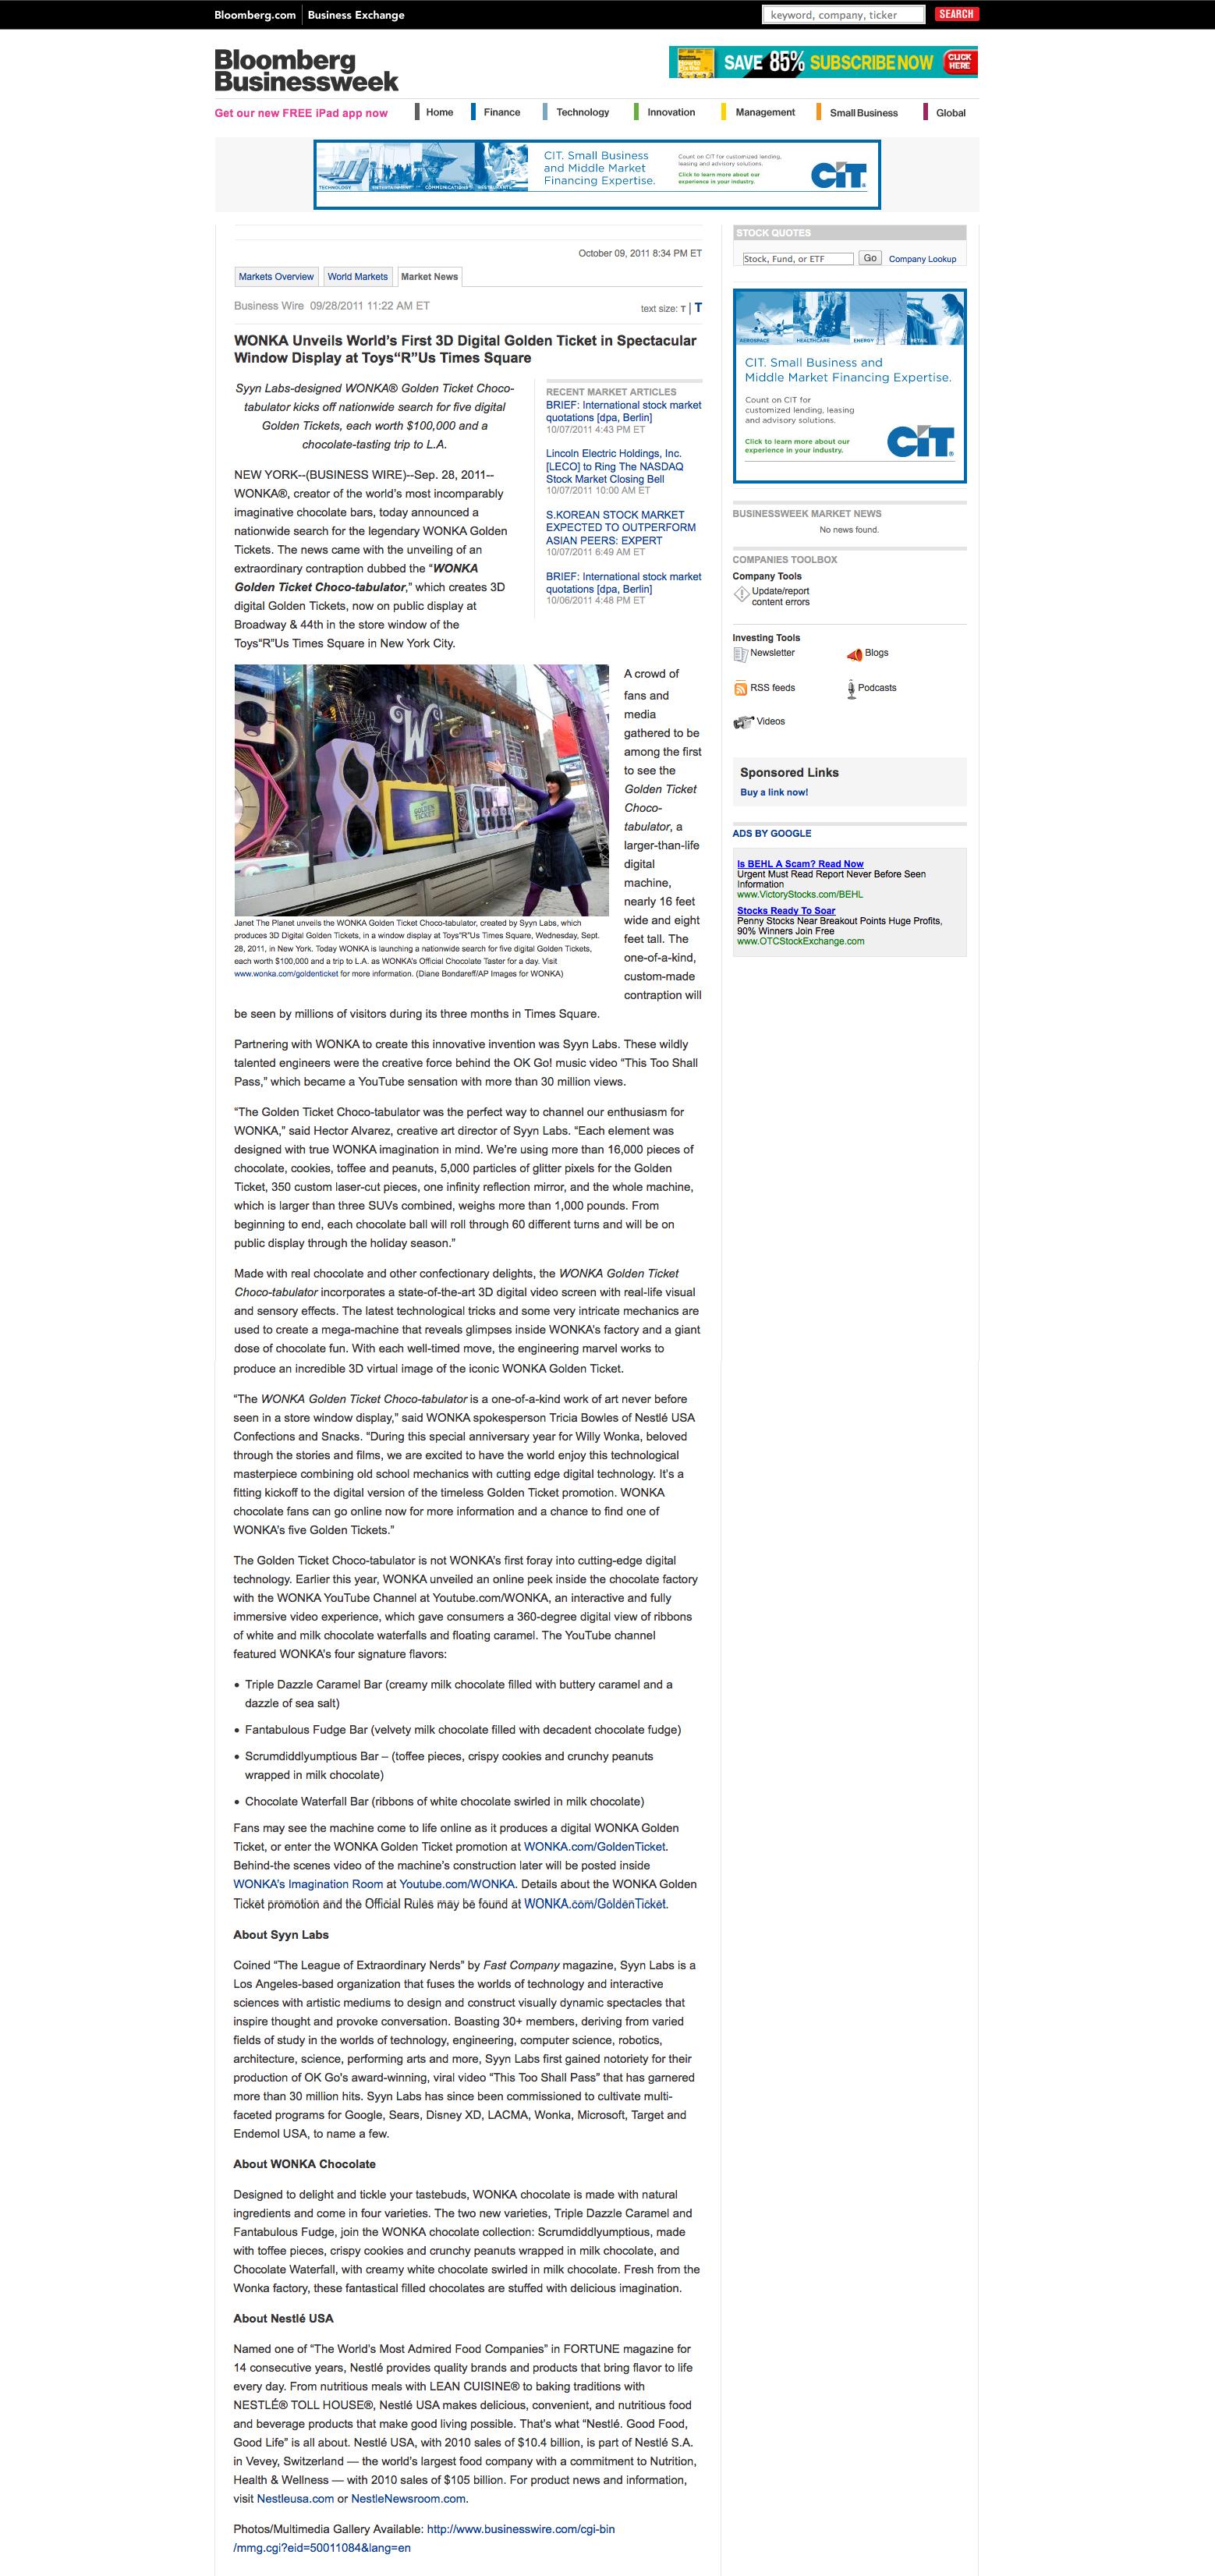 Bloomberg Businessweek – Wonka Unveils First 3D Digital Golden Ticket